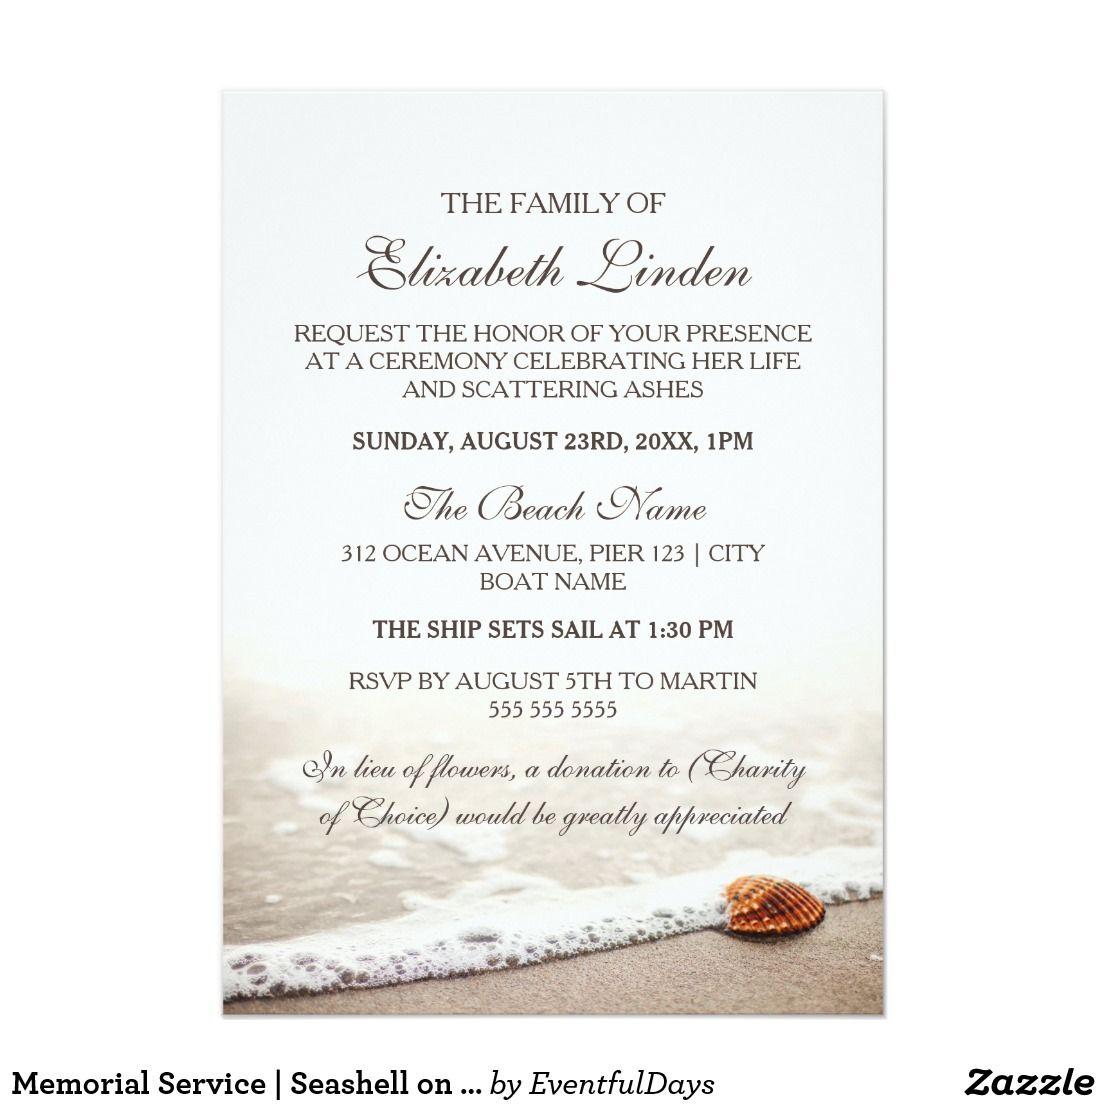 memorial service seashell on